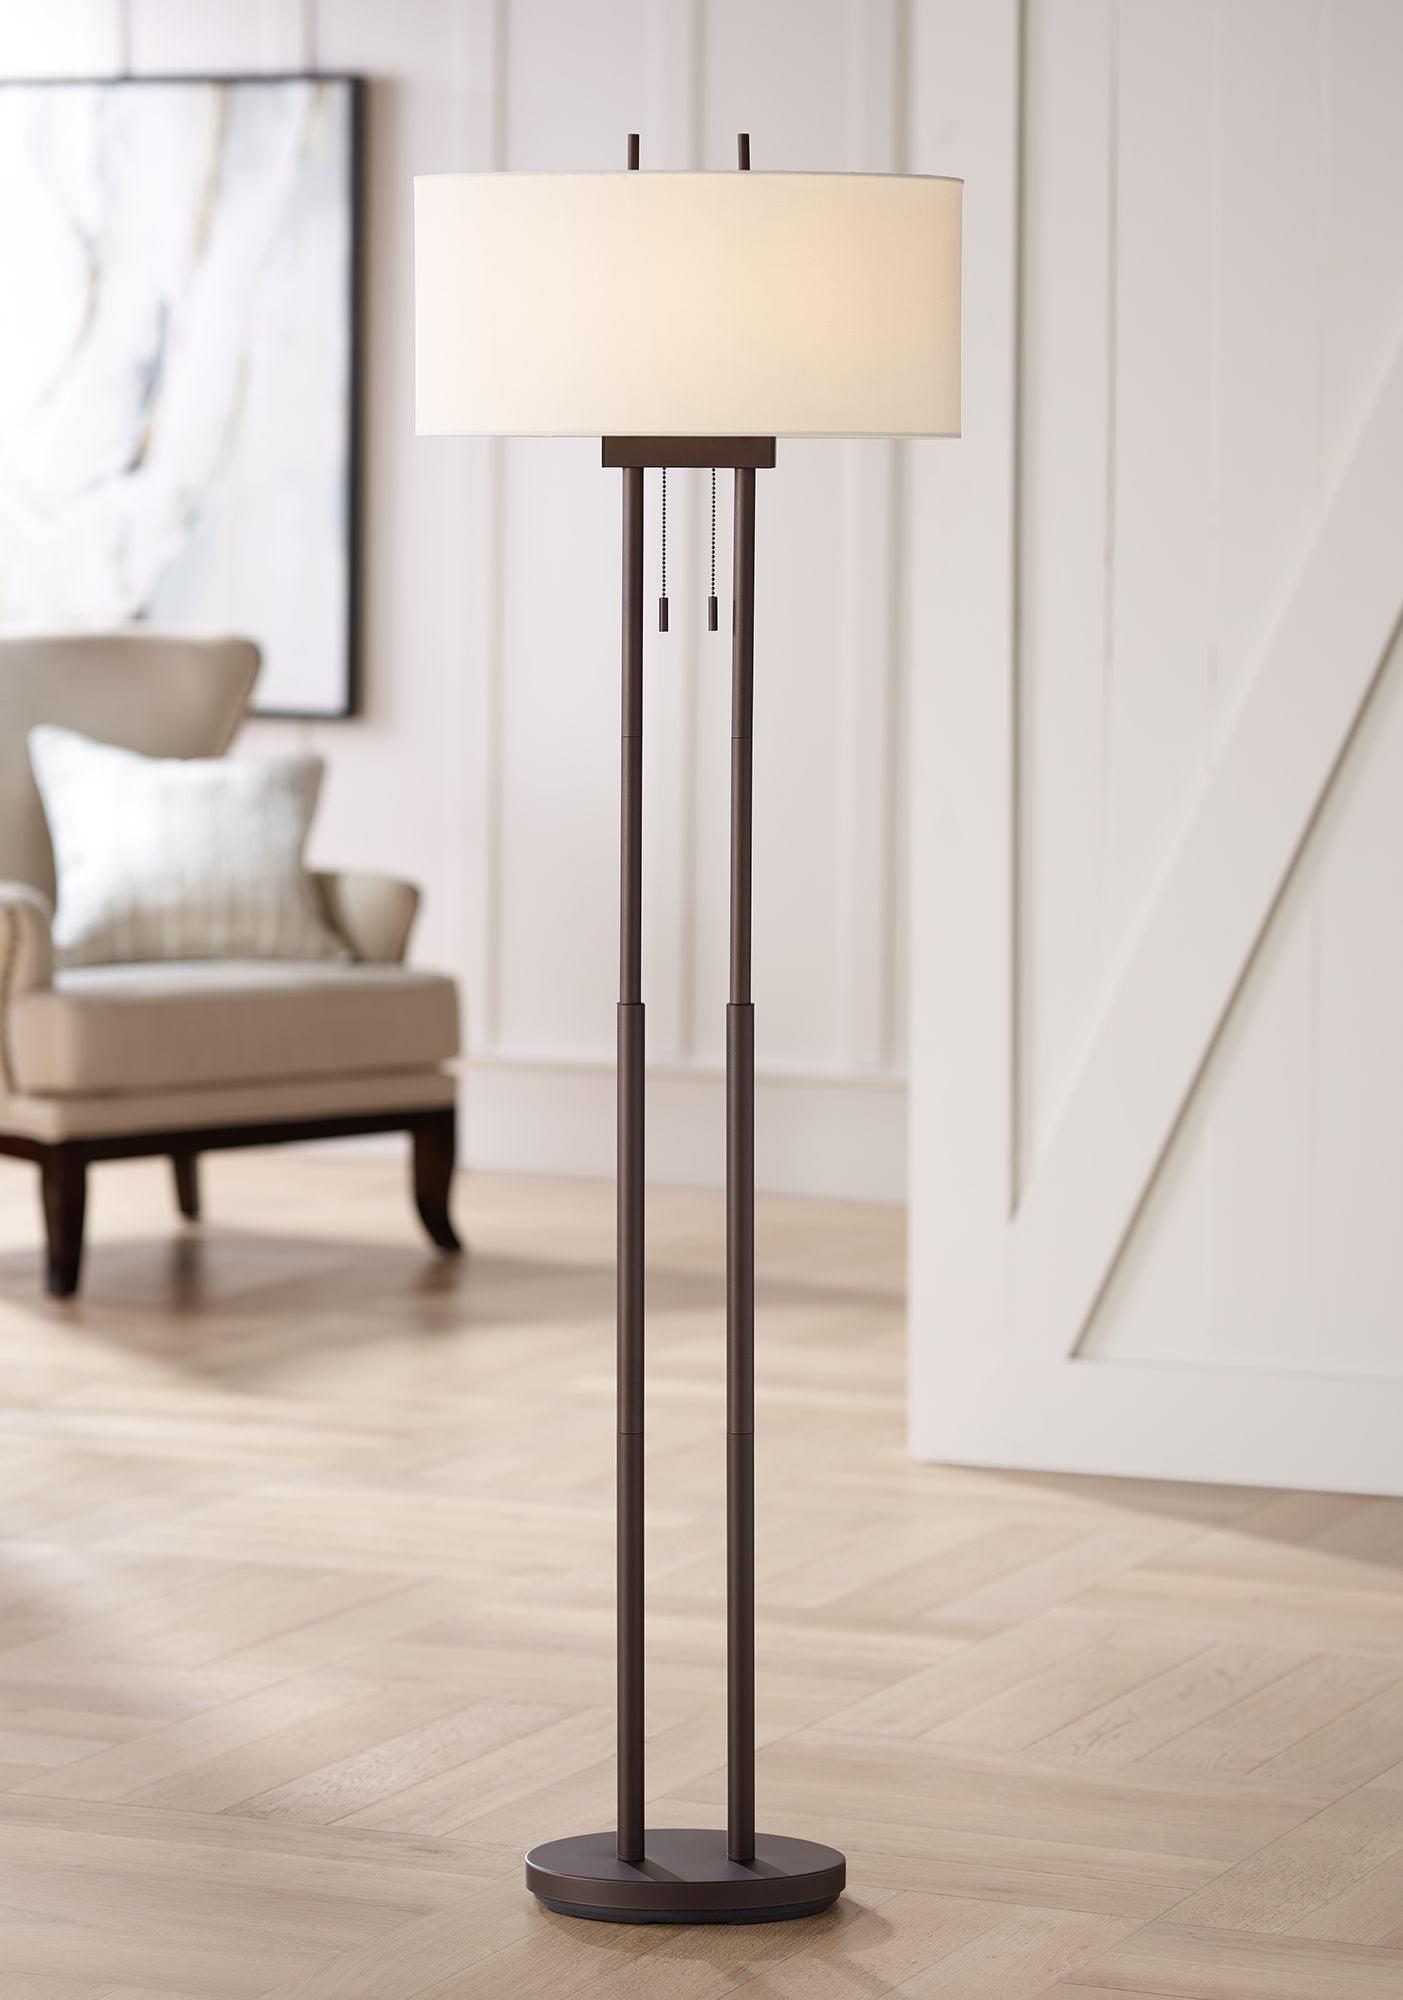 Lighting Modern Floor Lamp Twin Pole